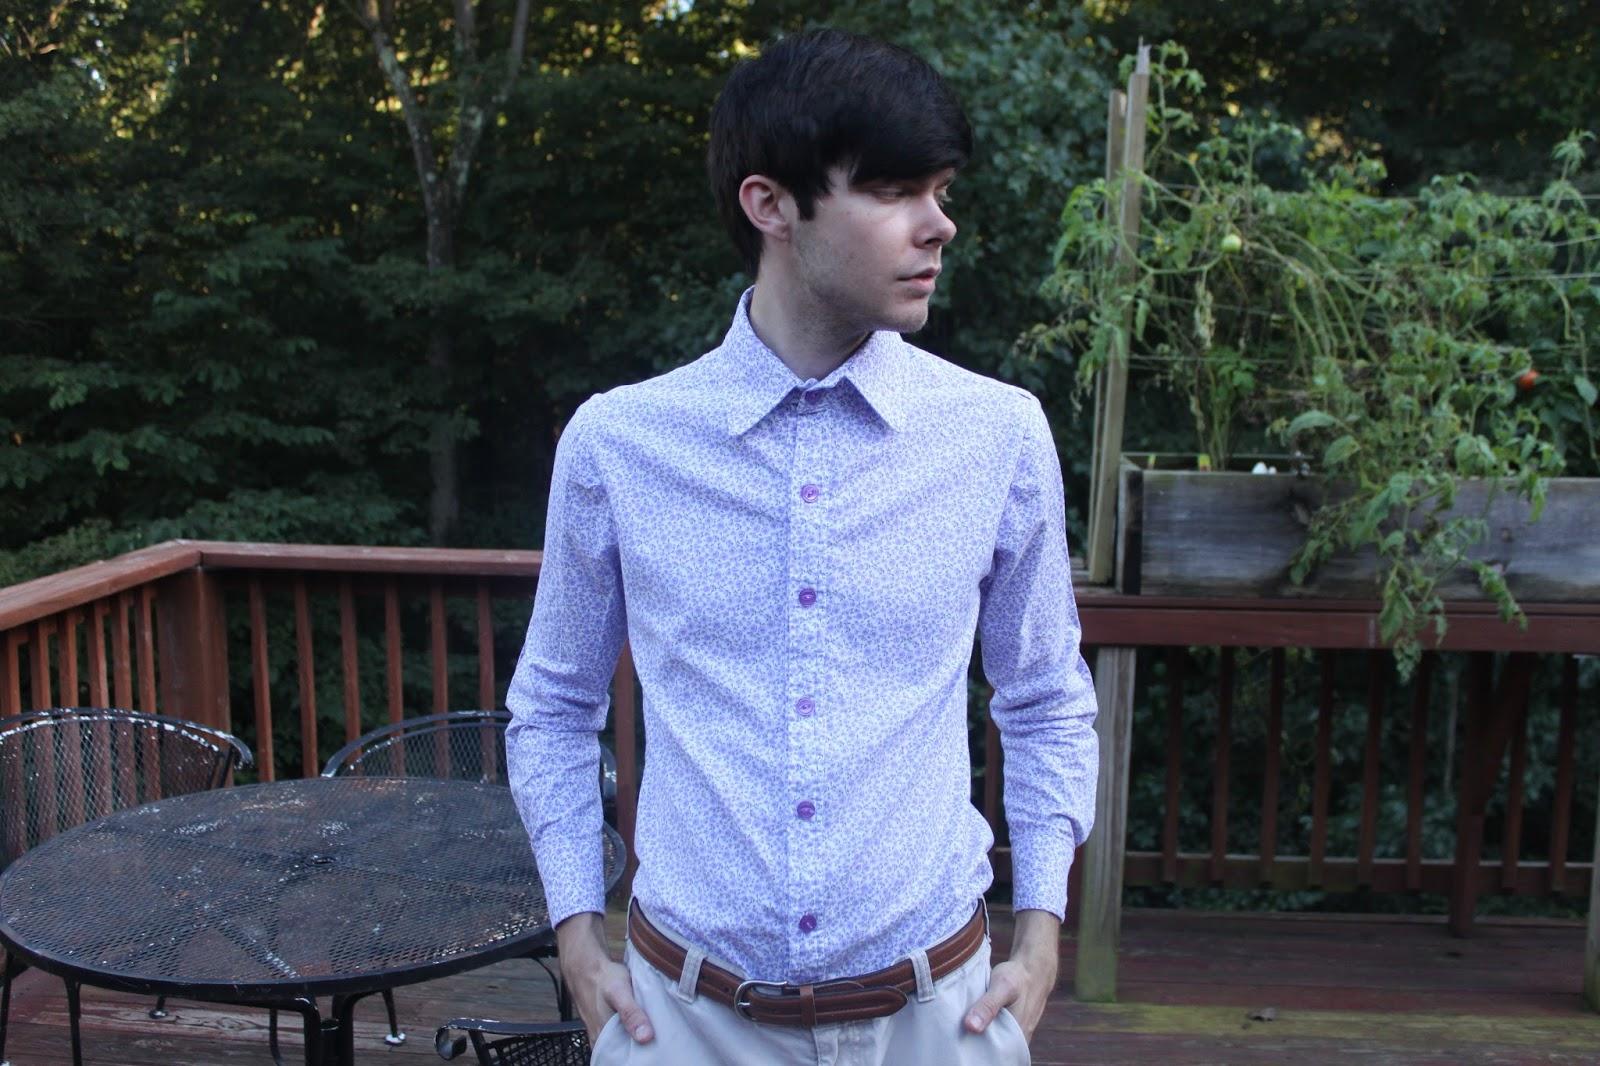 Sewing a men's purple shirt